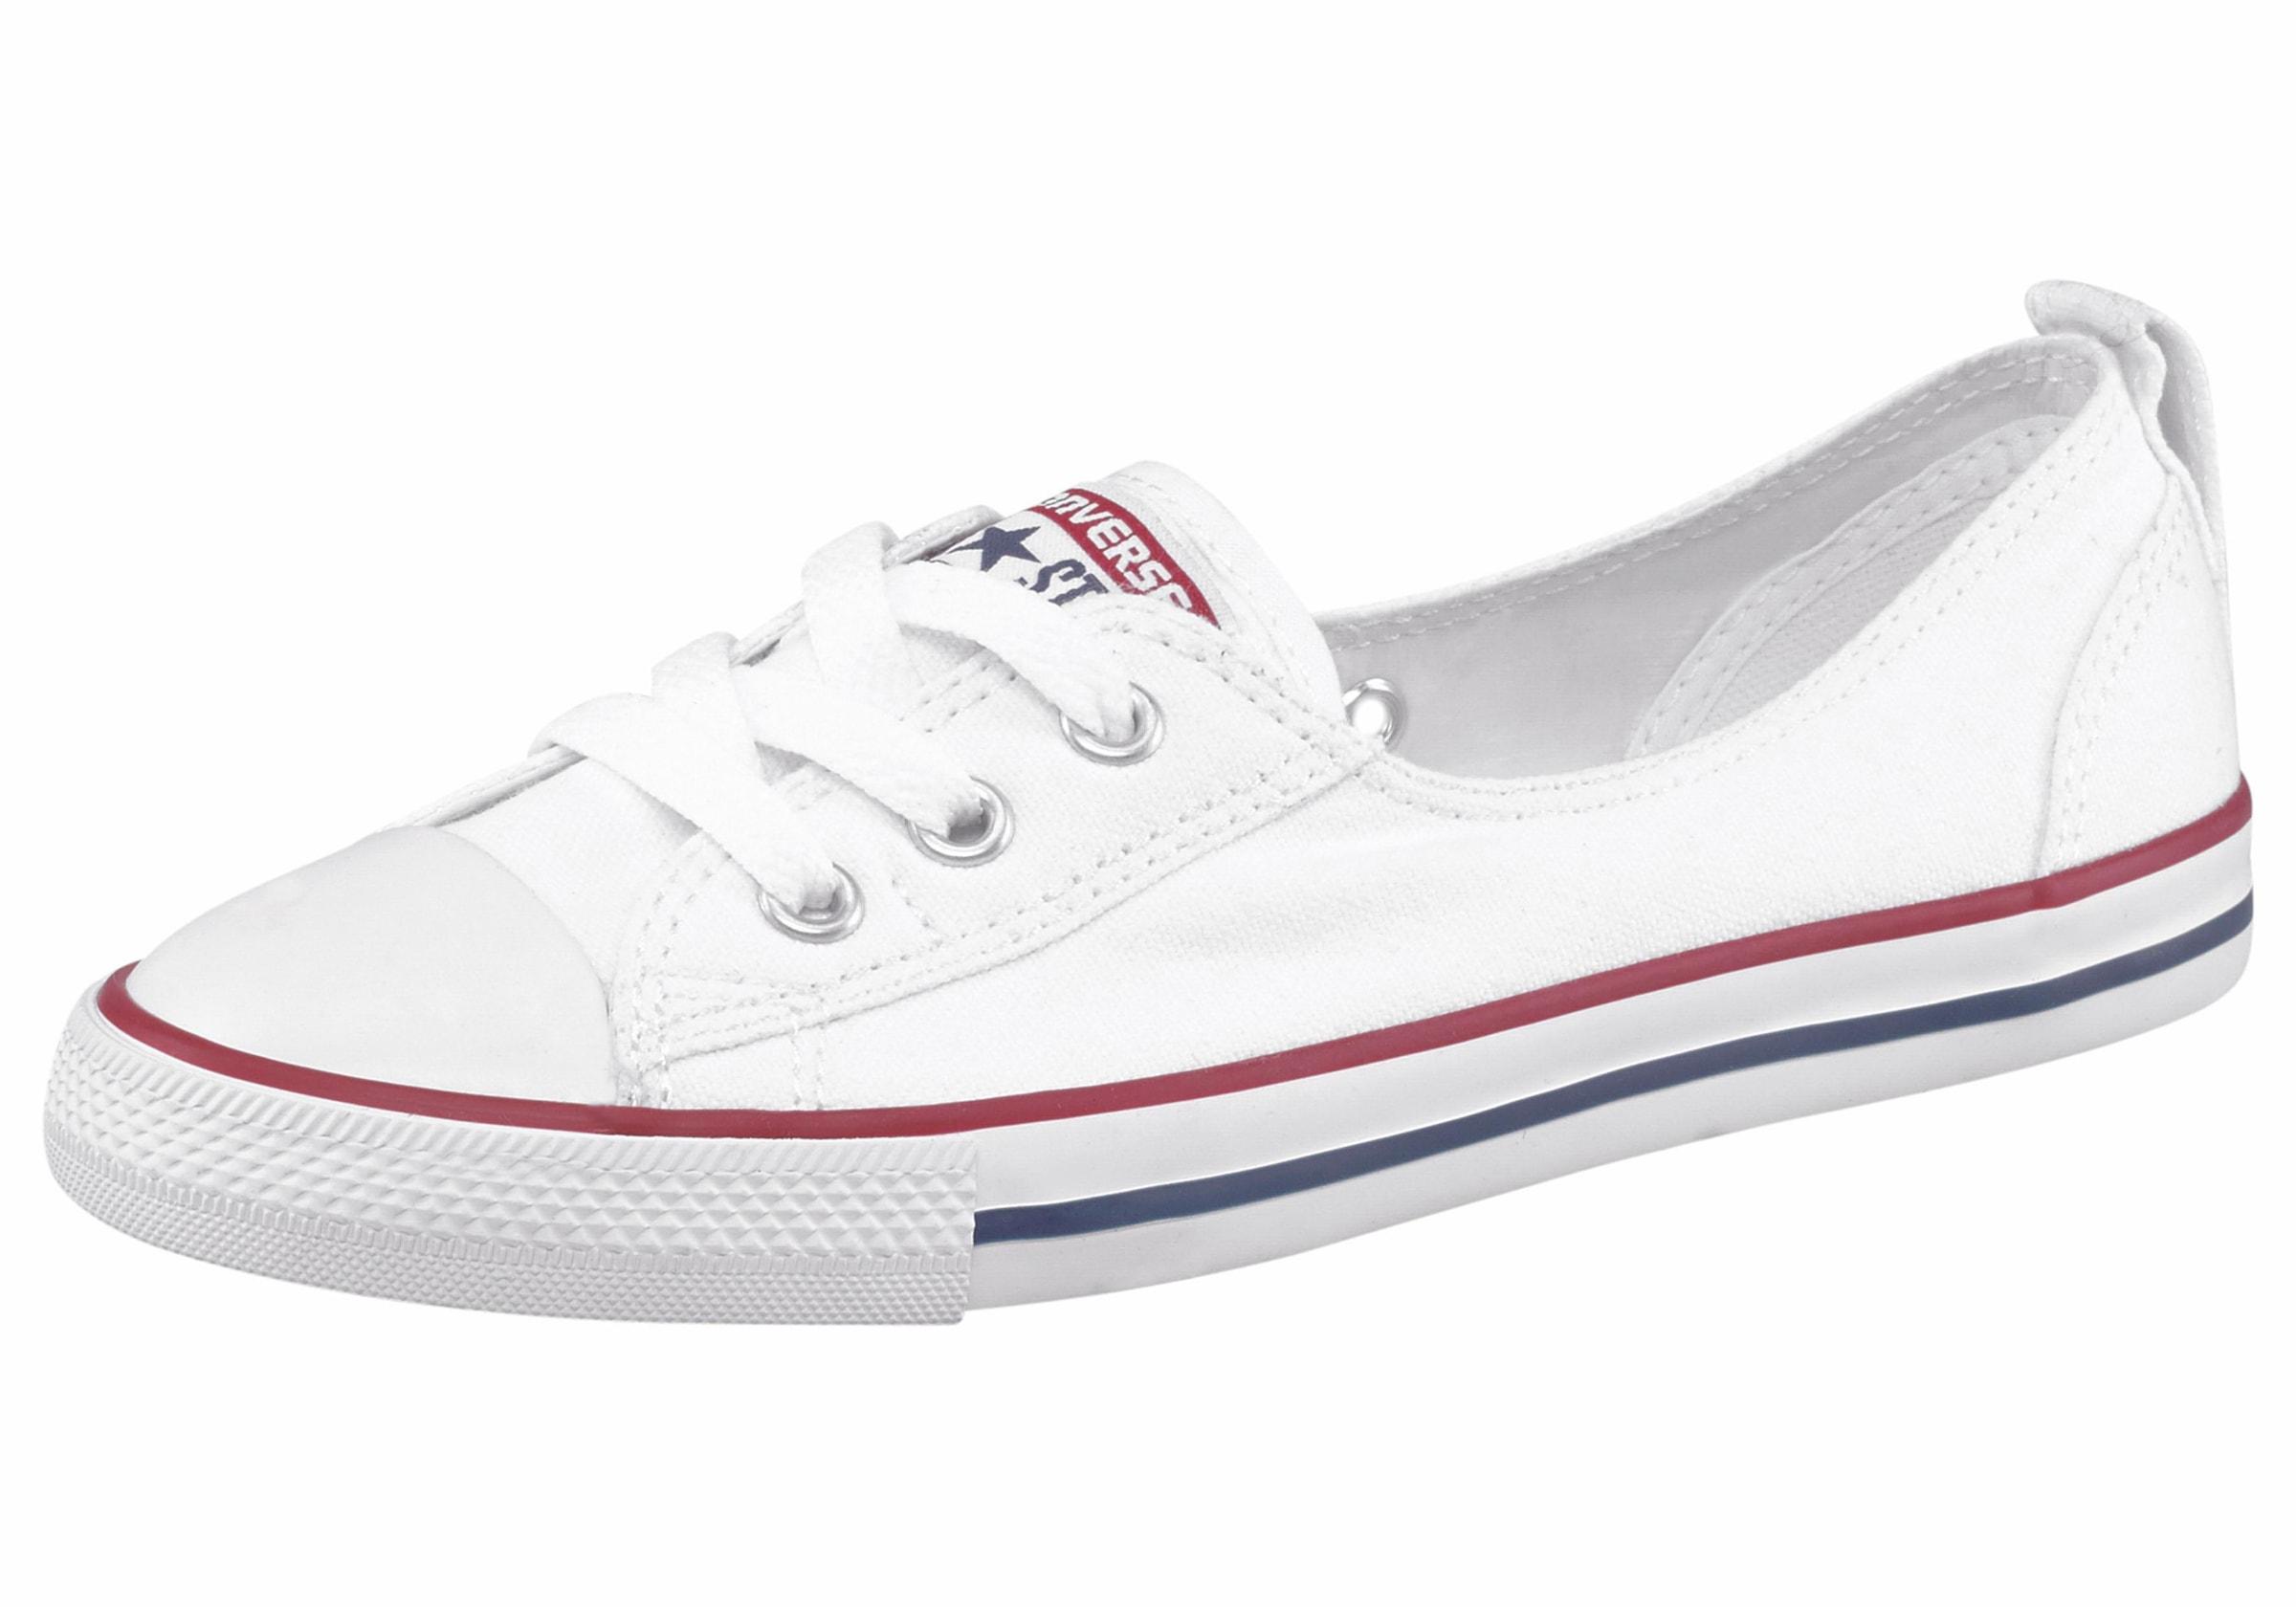 Converse Sneaker »Chuck Taylor All Star Ballet Lace Ox« günstig kaufen |  BAUR